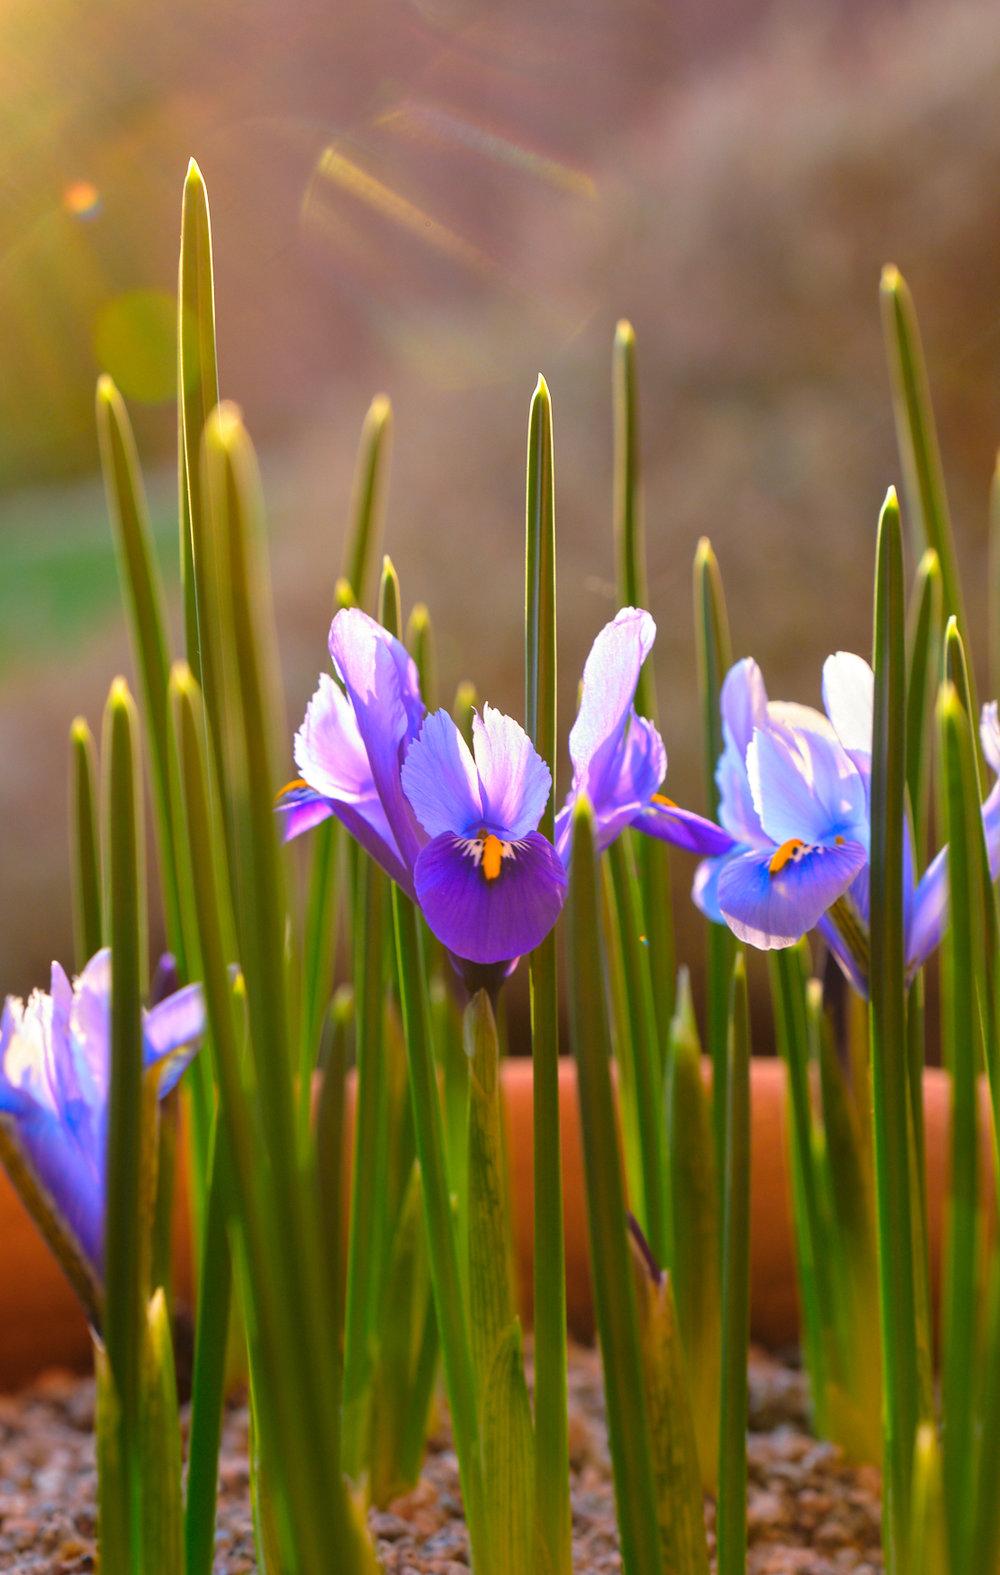 _DSF4398 - Irises.jpg